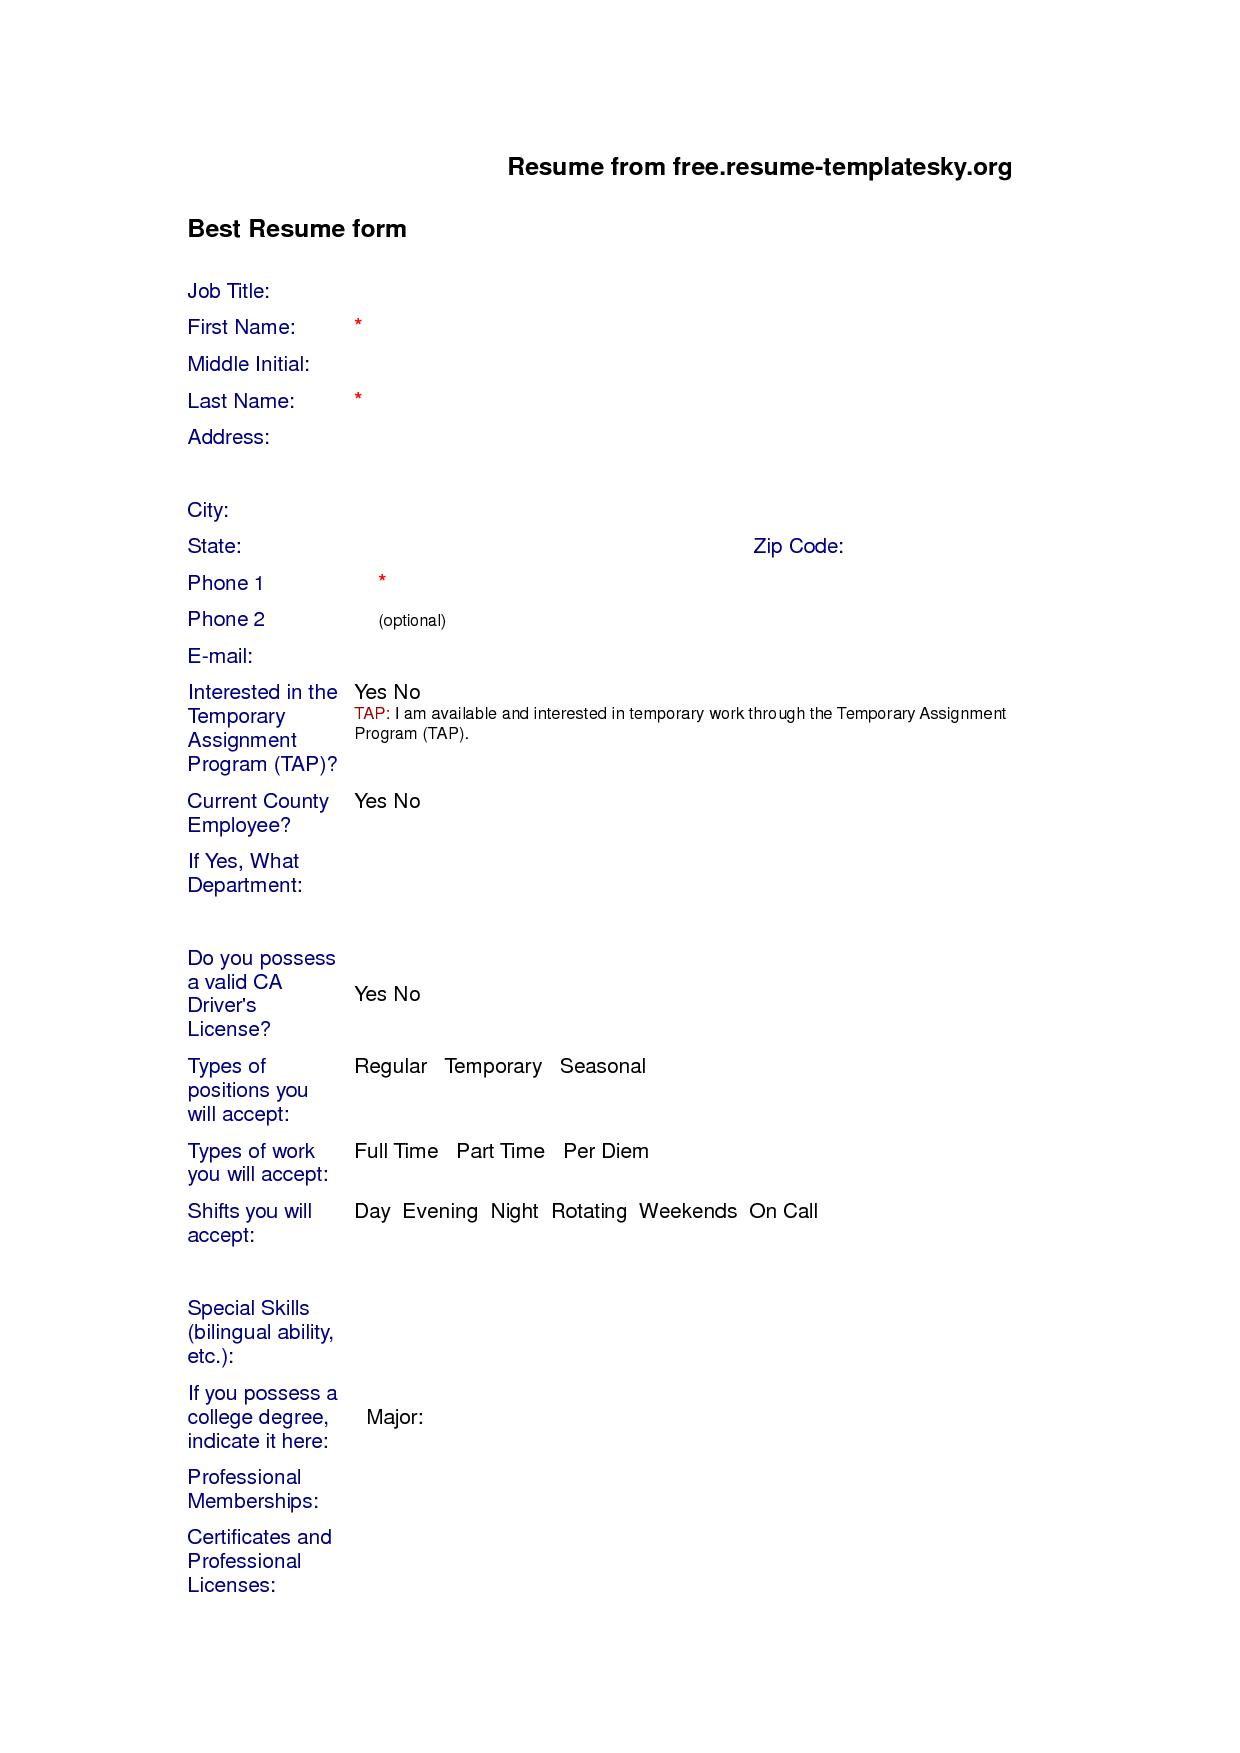 Resume Format Sheet Format Resume Resumeformat Sheet Downloadable Resume Template Resume Form Sample Resume Format